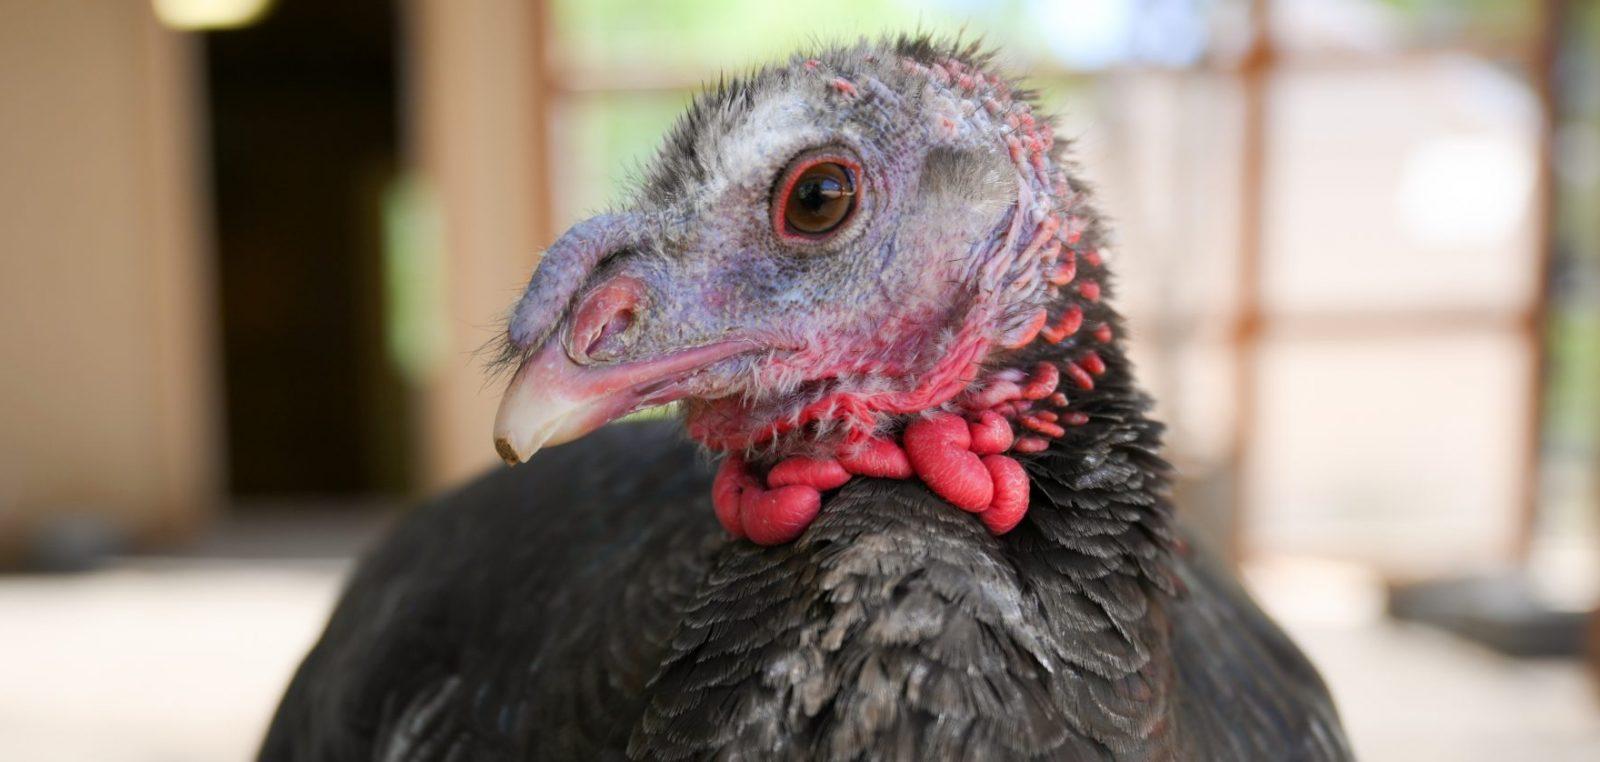 Serena Turkey at Farm Sanctuary's Southern California shelter